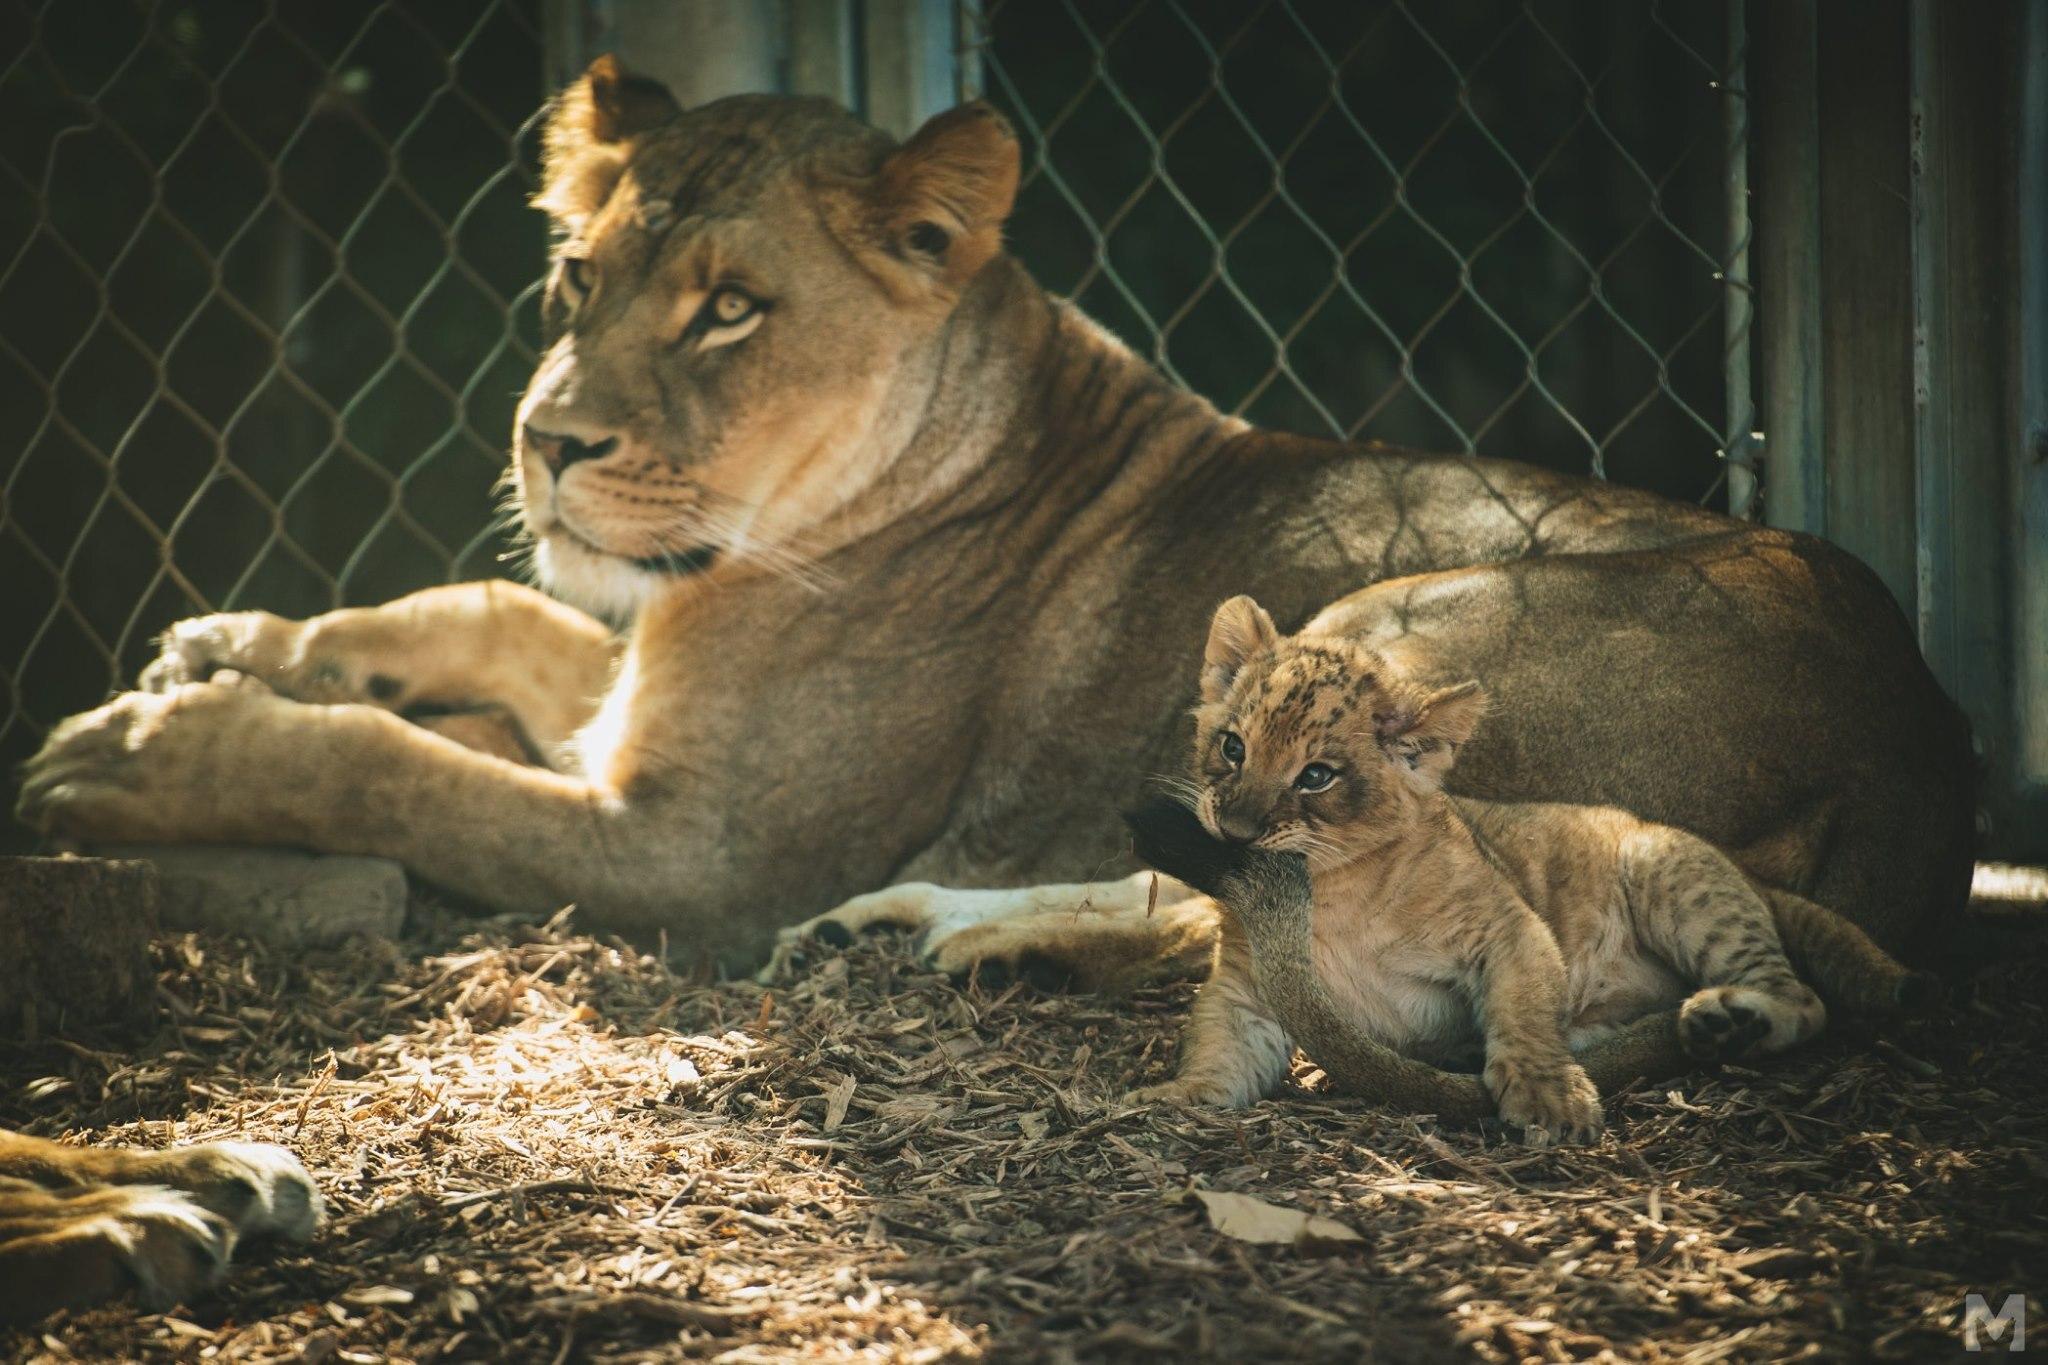 Lion Cub_9_Molly McCormick.jpg